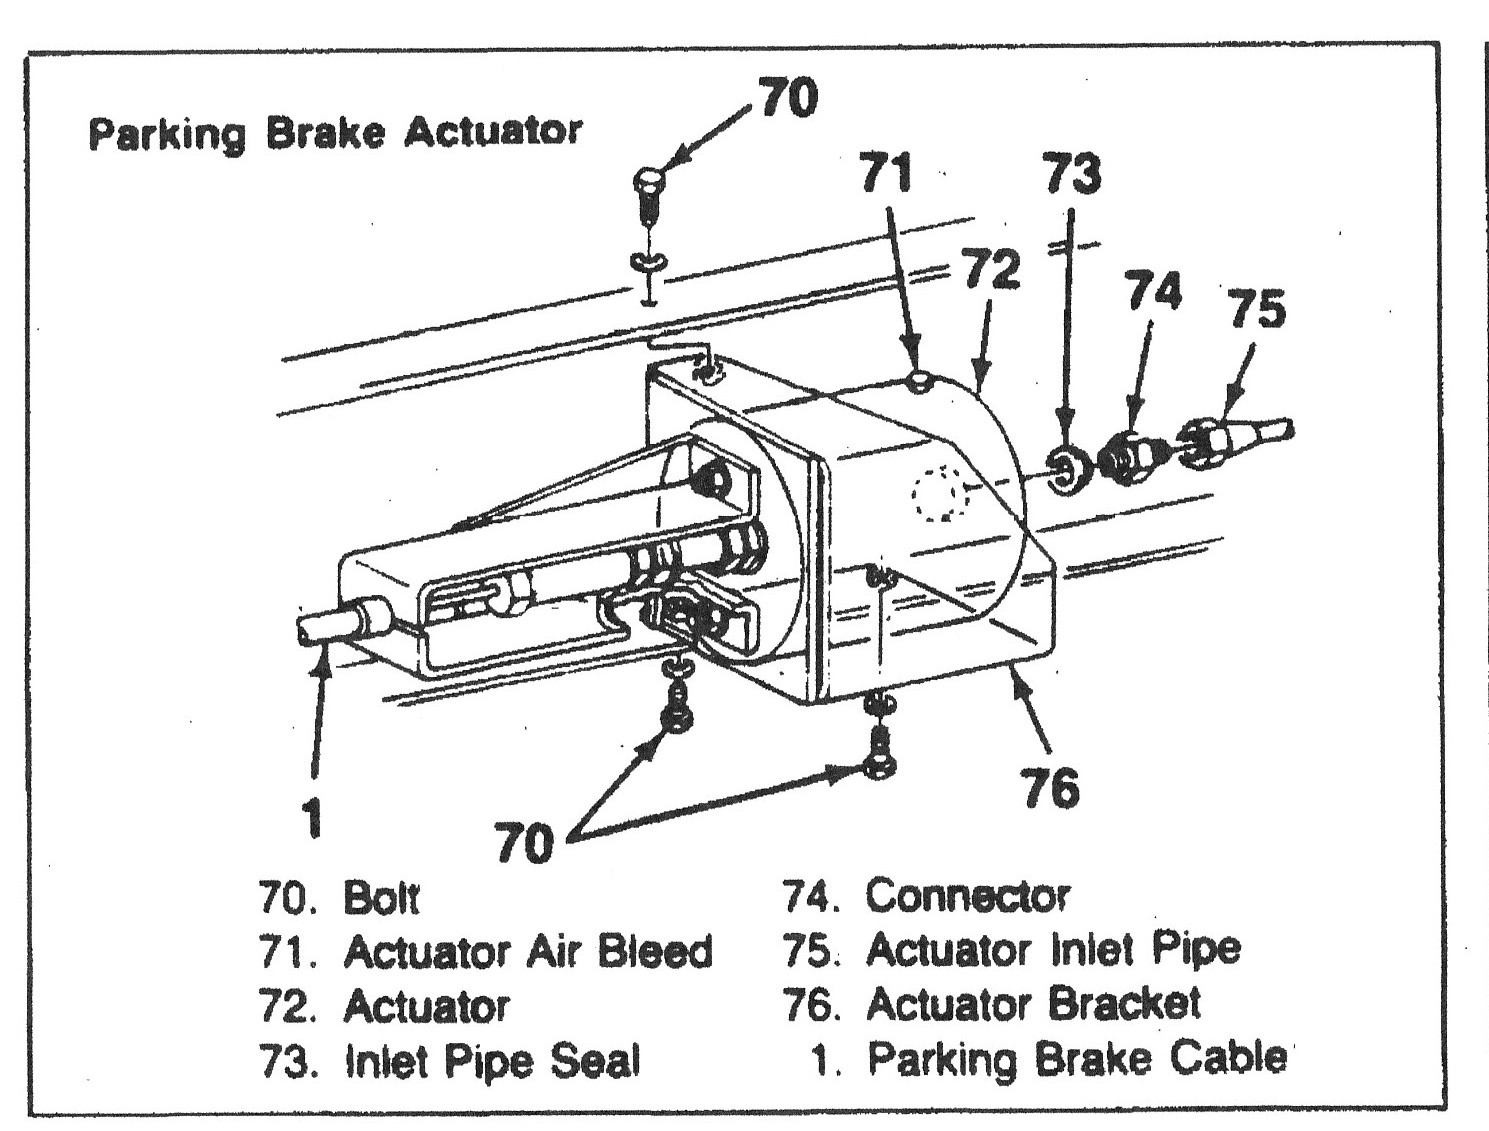 1991 chevy astro wiring diagram 2001 astro wiring diagram